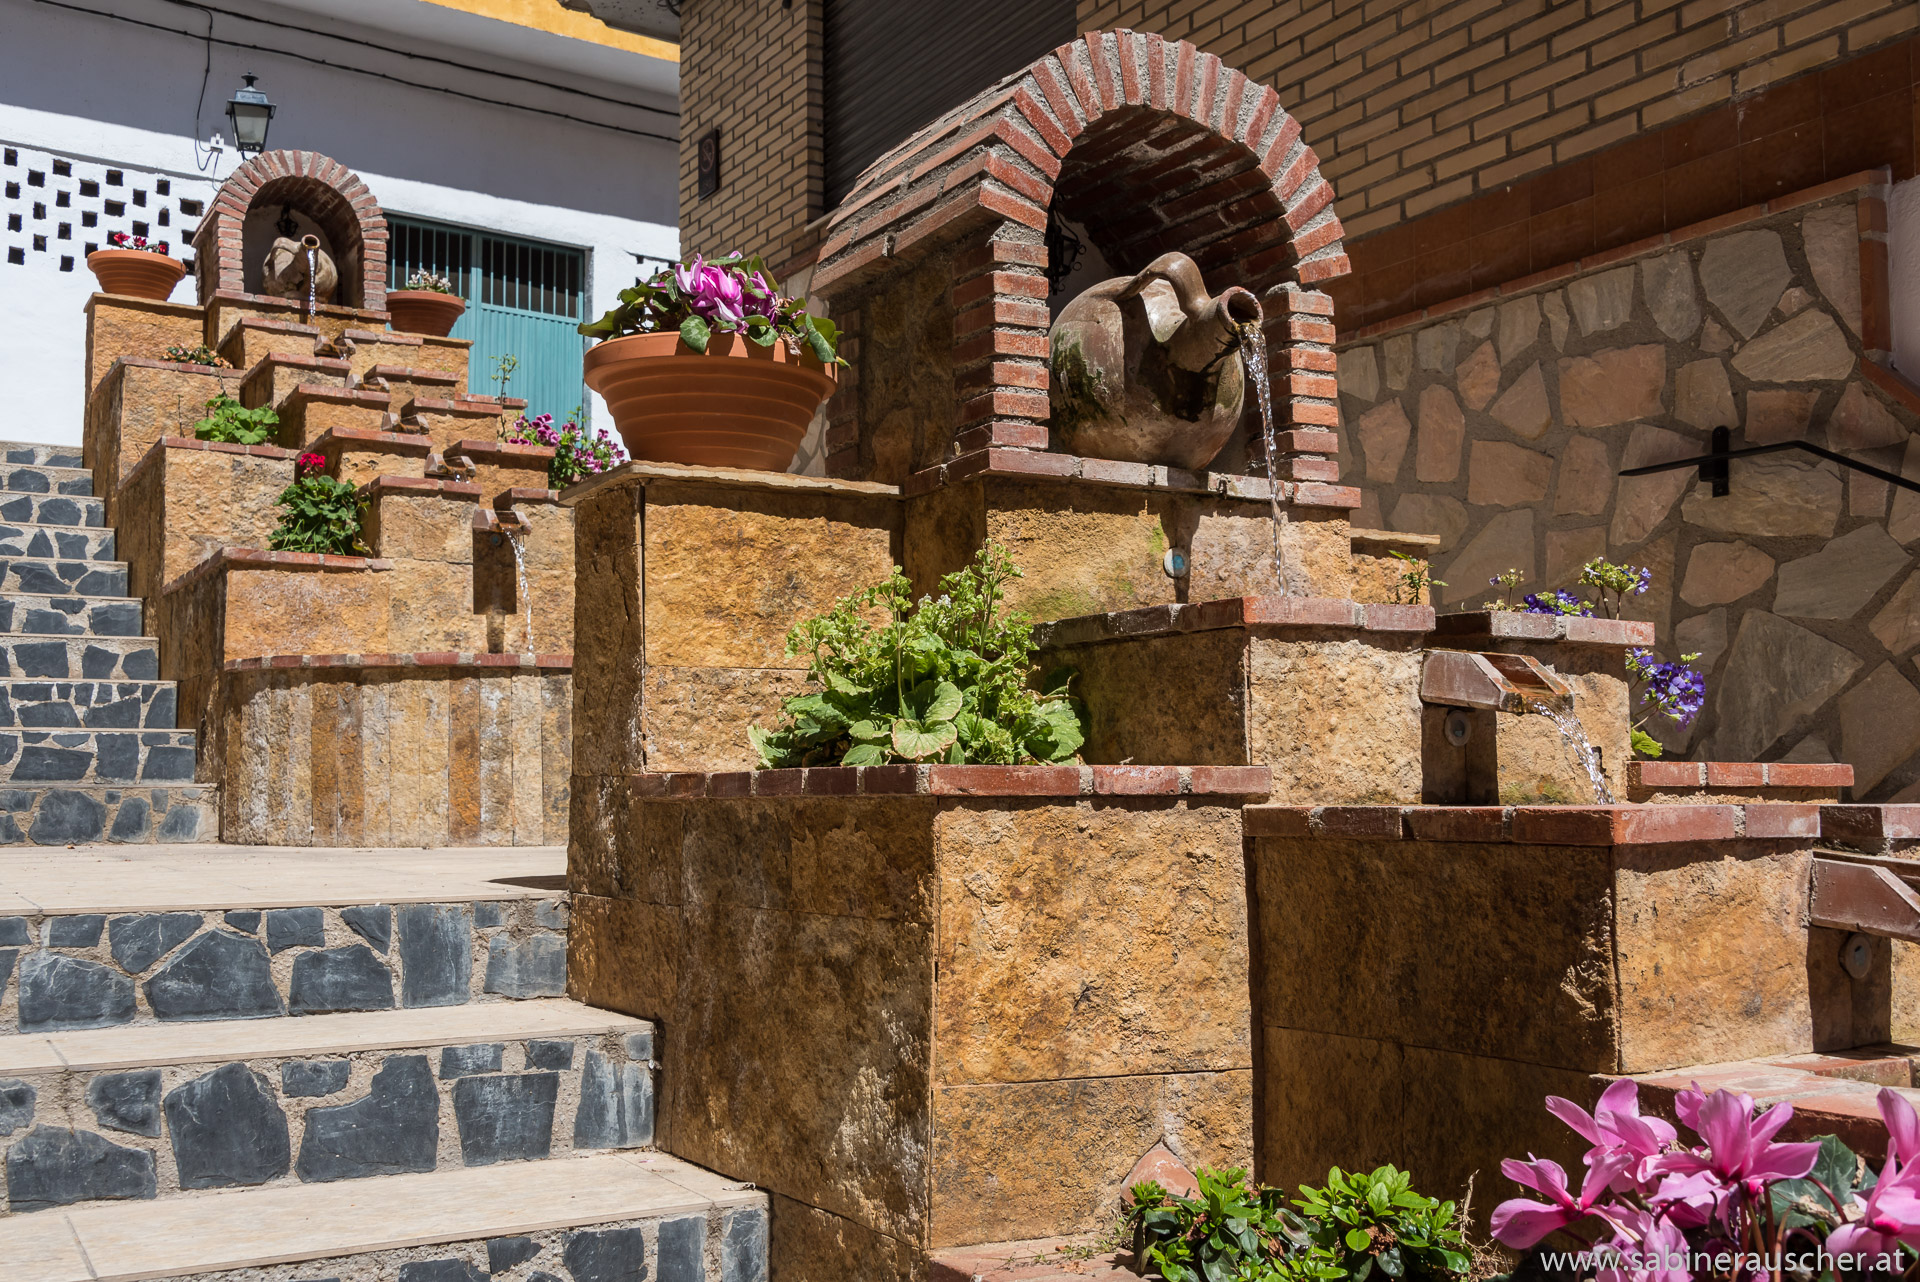 Fountain in Lanjaron in Alpujarra | Brunnen im Wasserort Lanjaron in Alpujarra